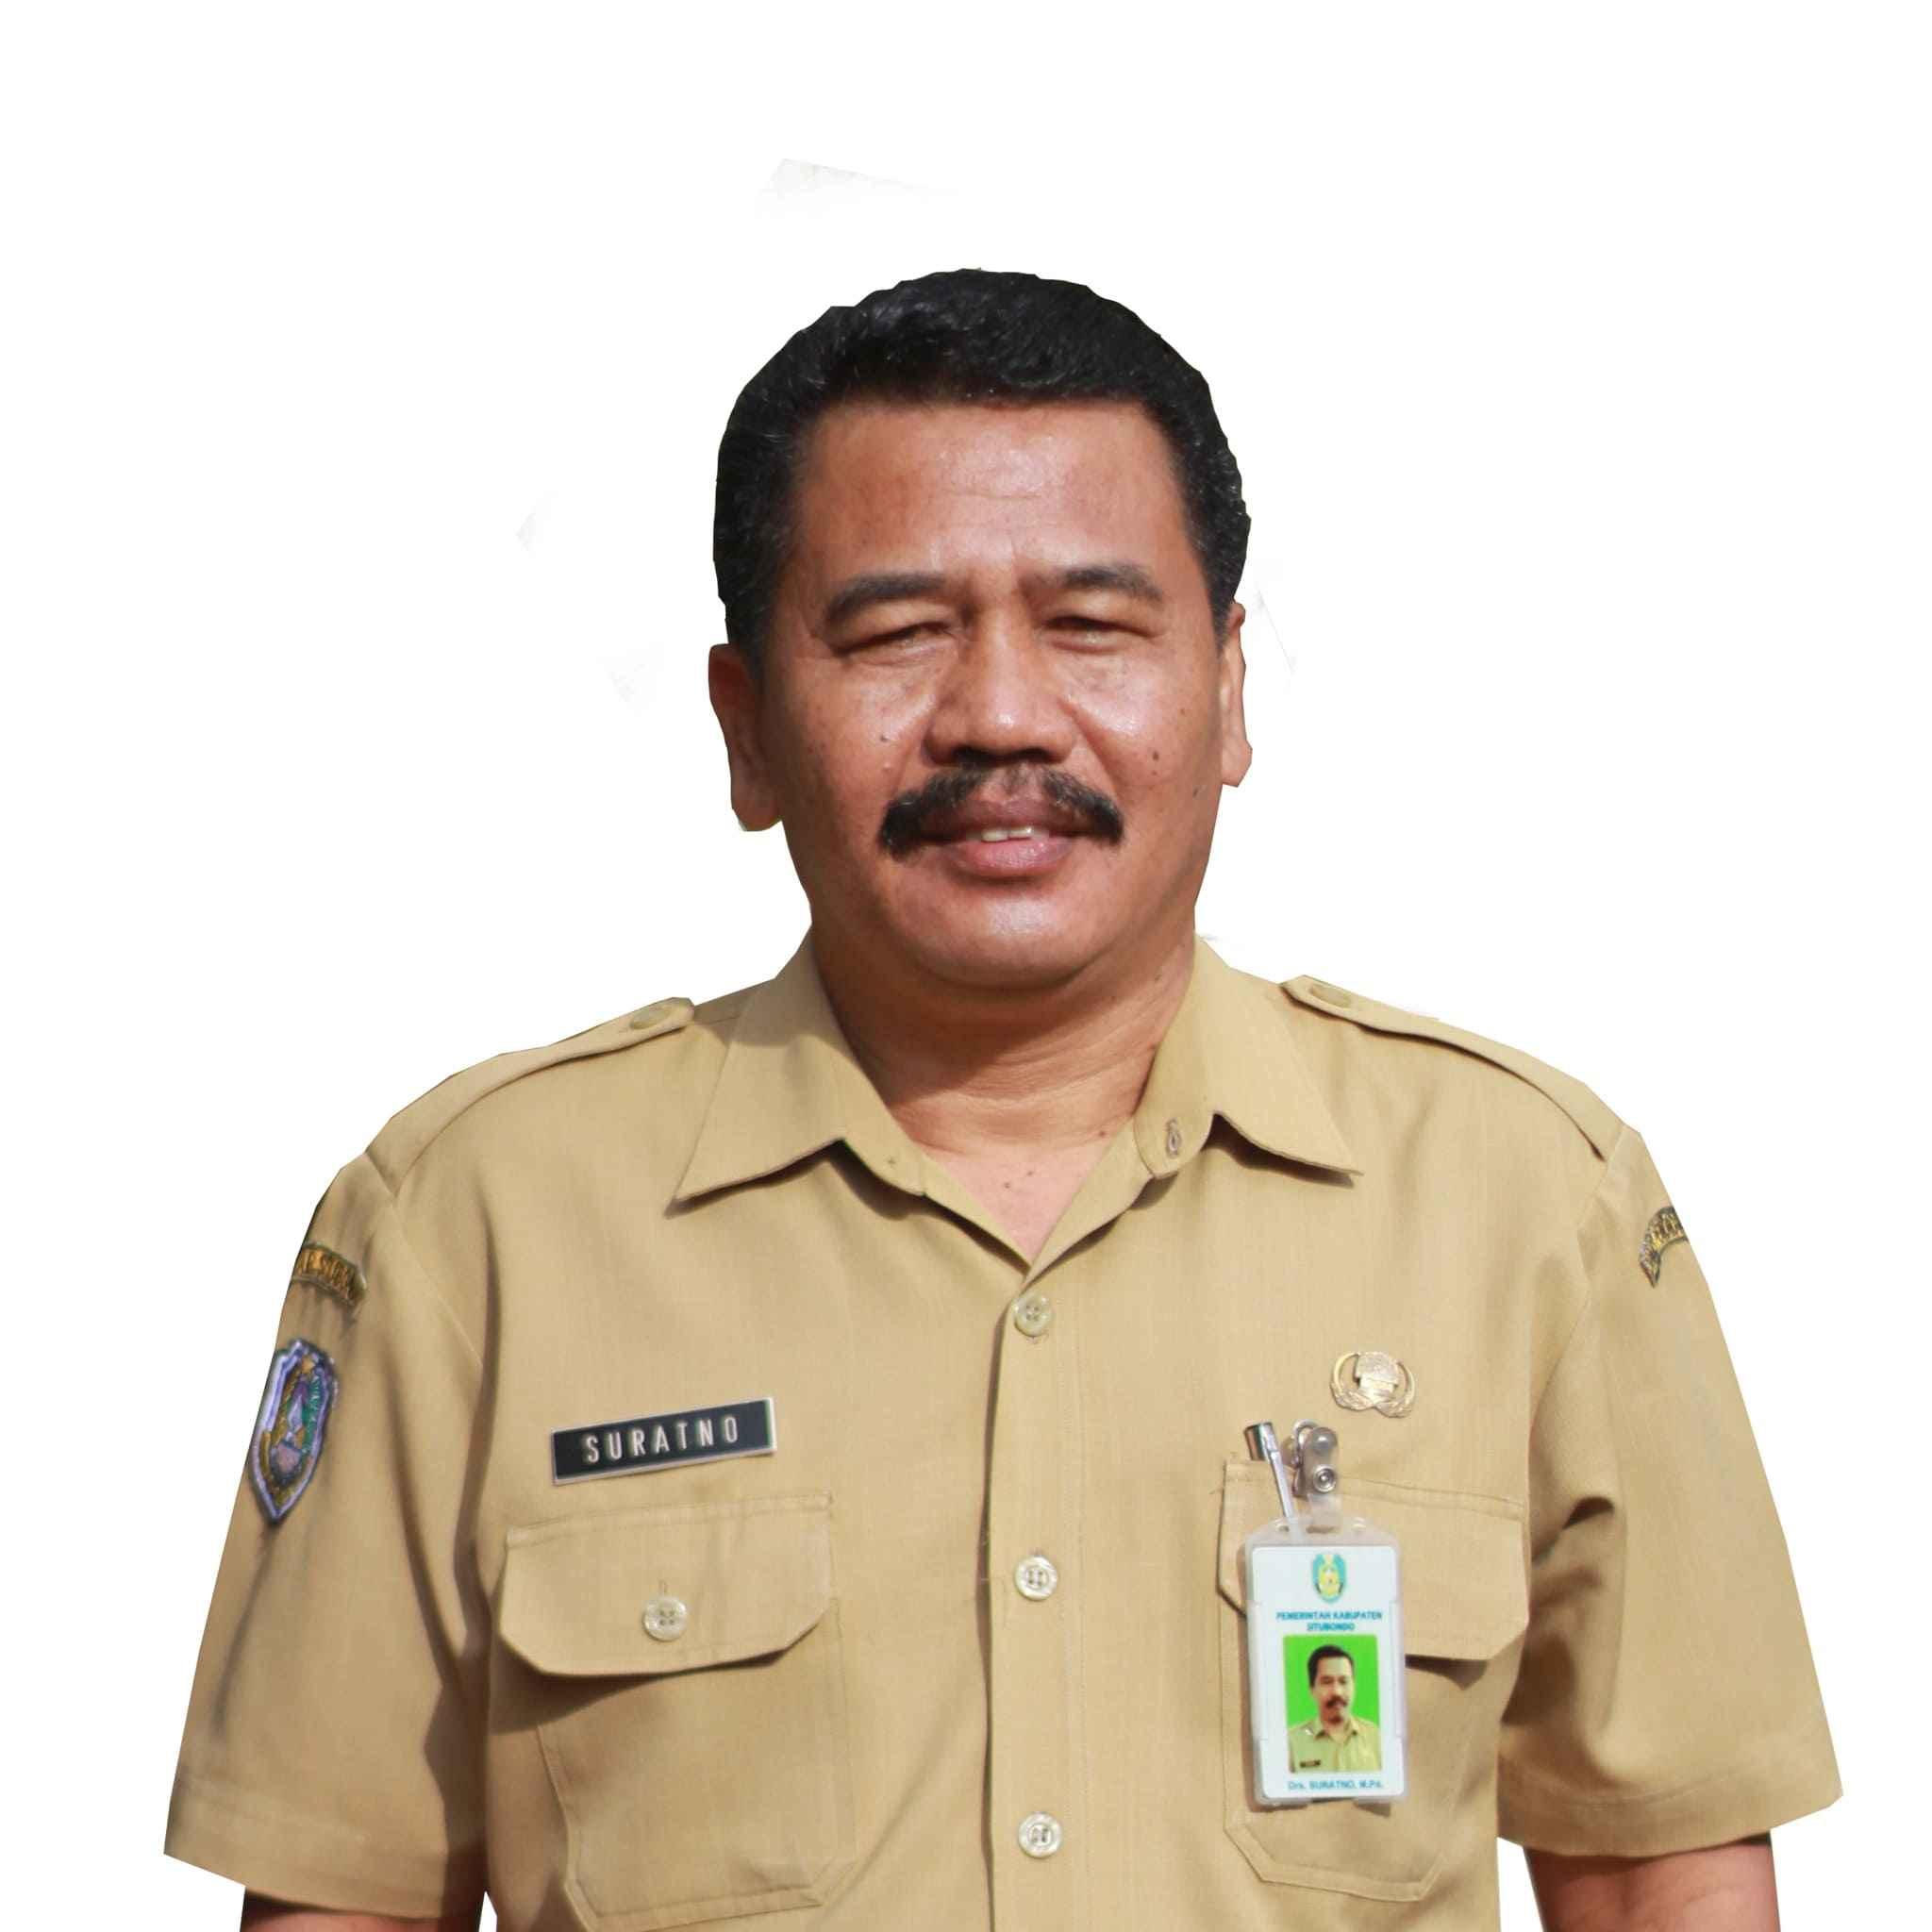 Drs. SURATNO, M.Pd